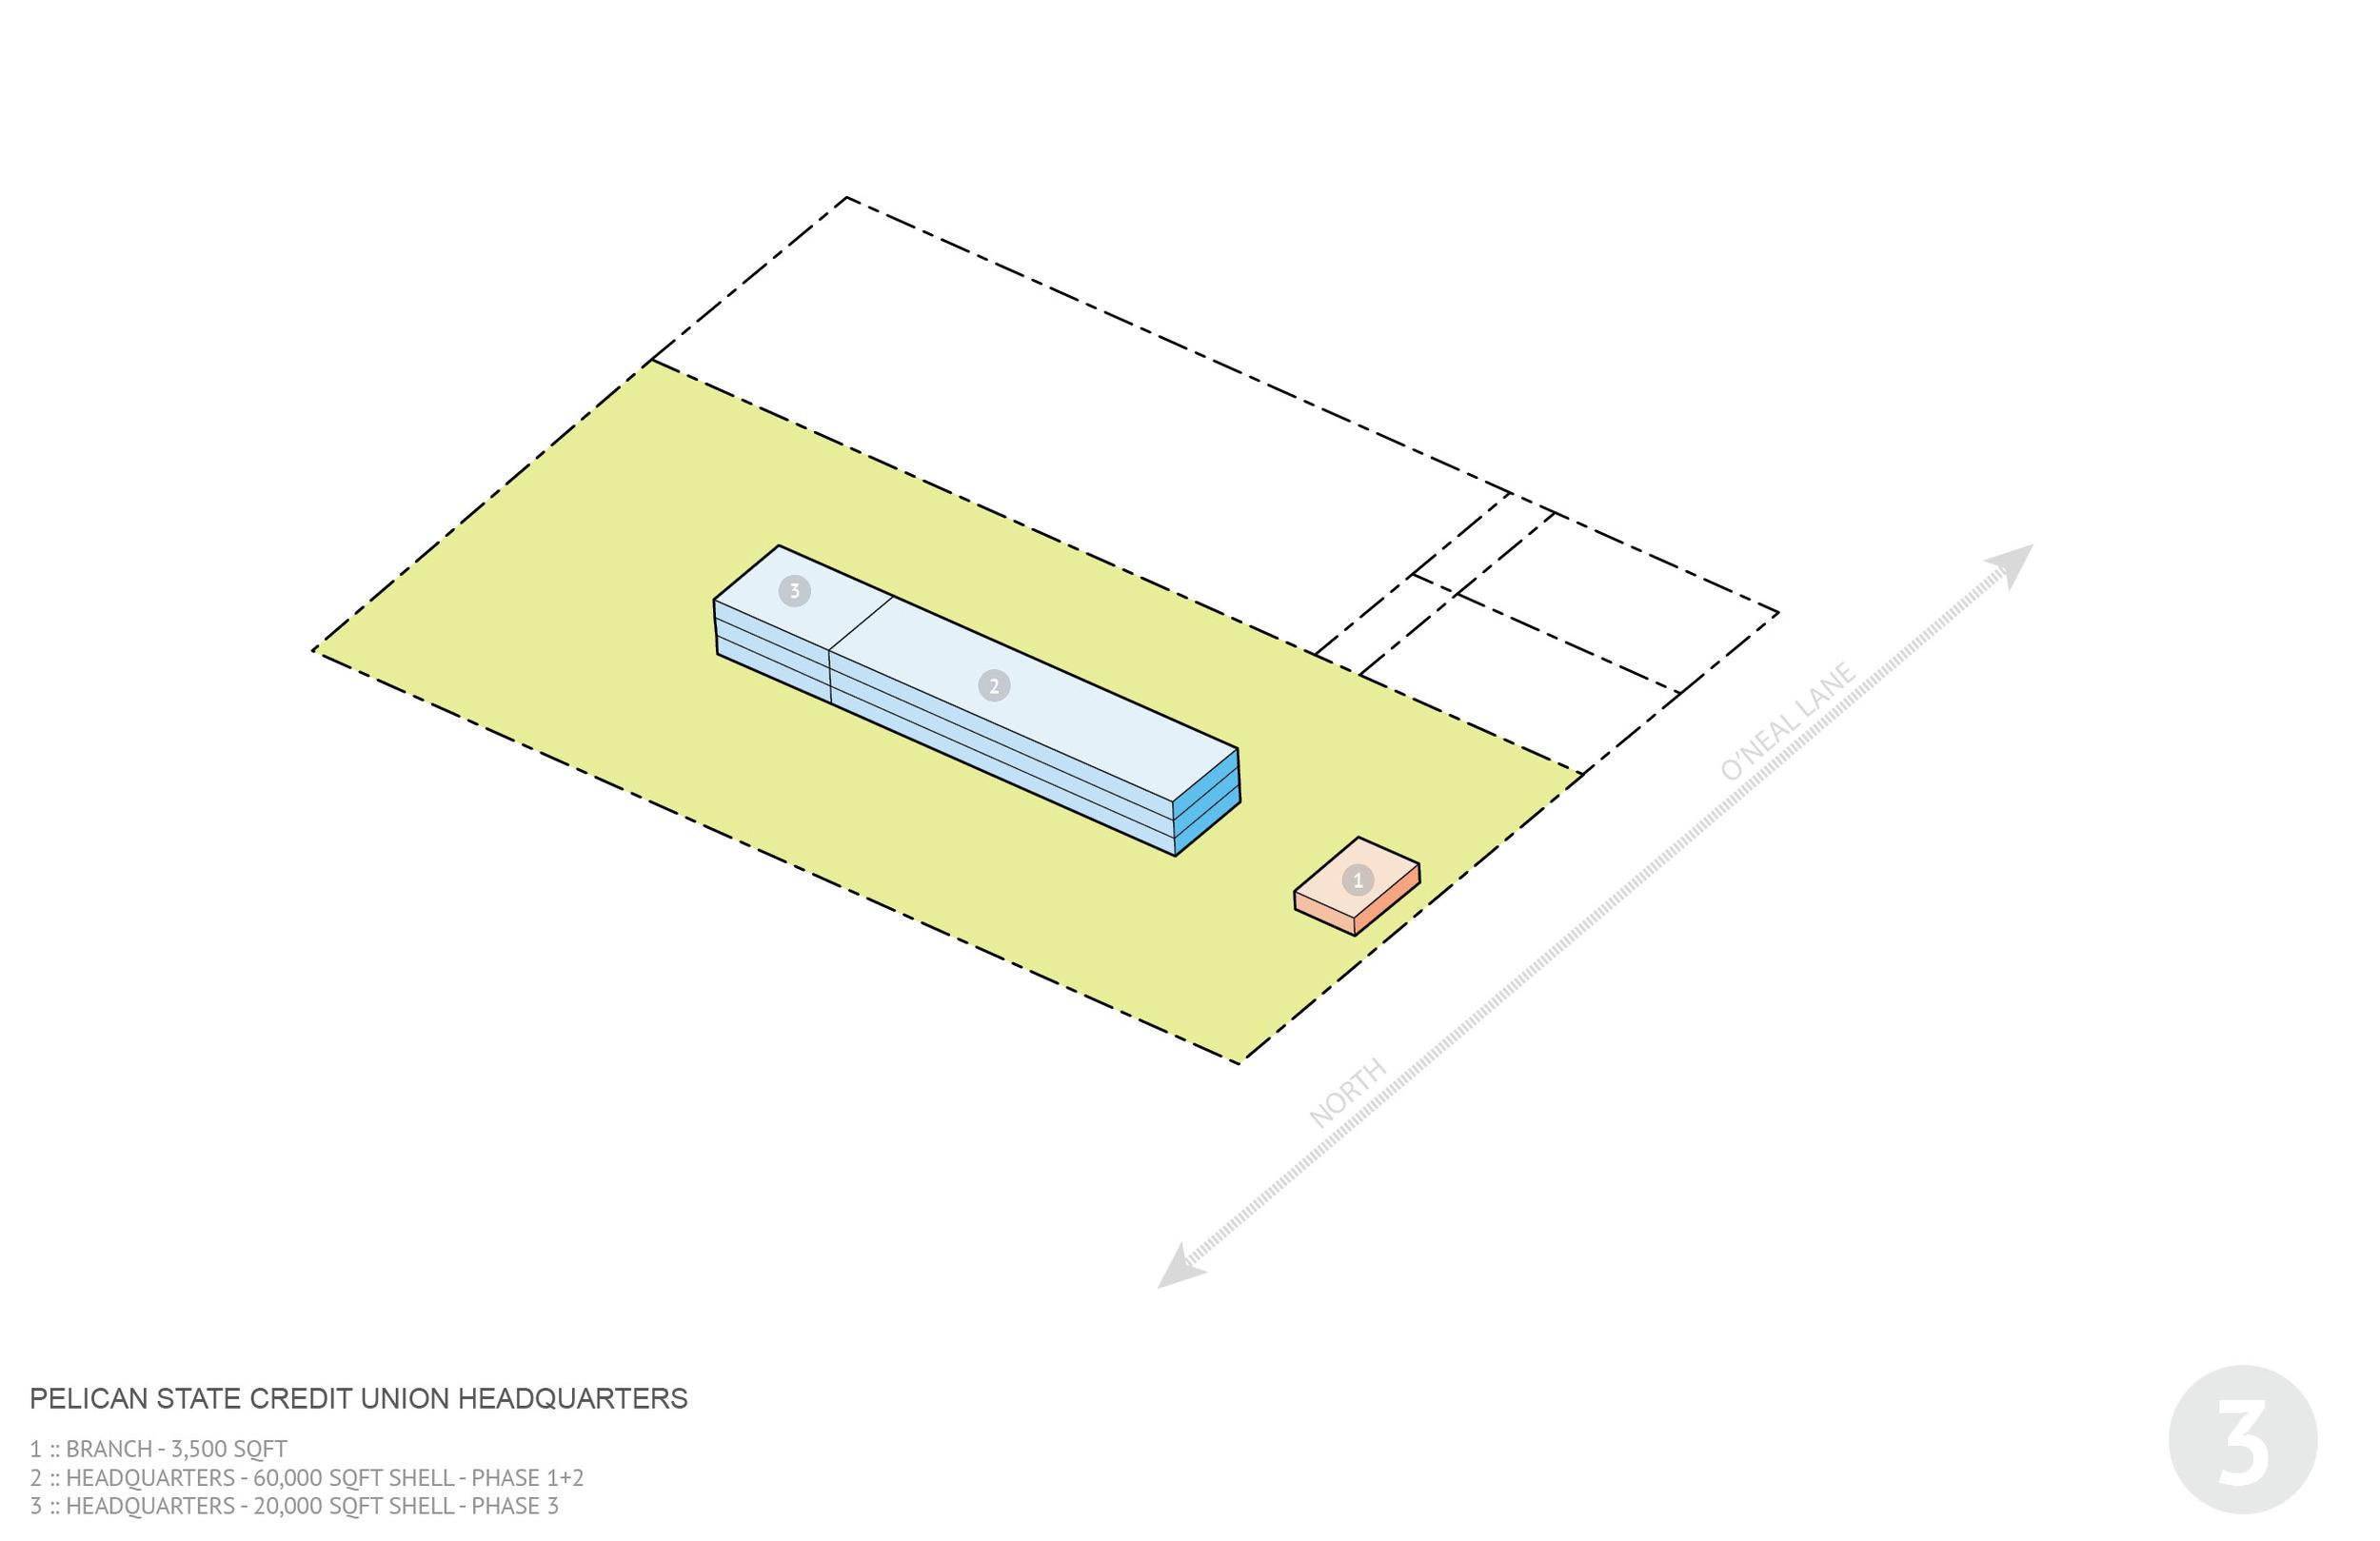 A_SlideshowDiagram_3.jpg